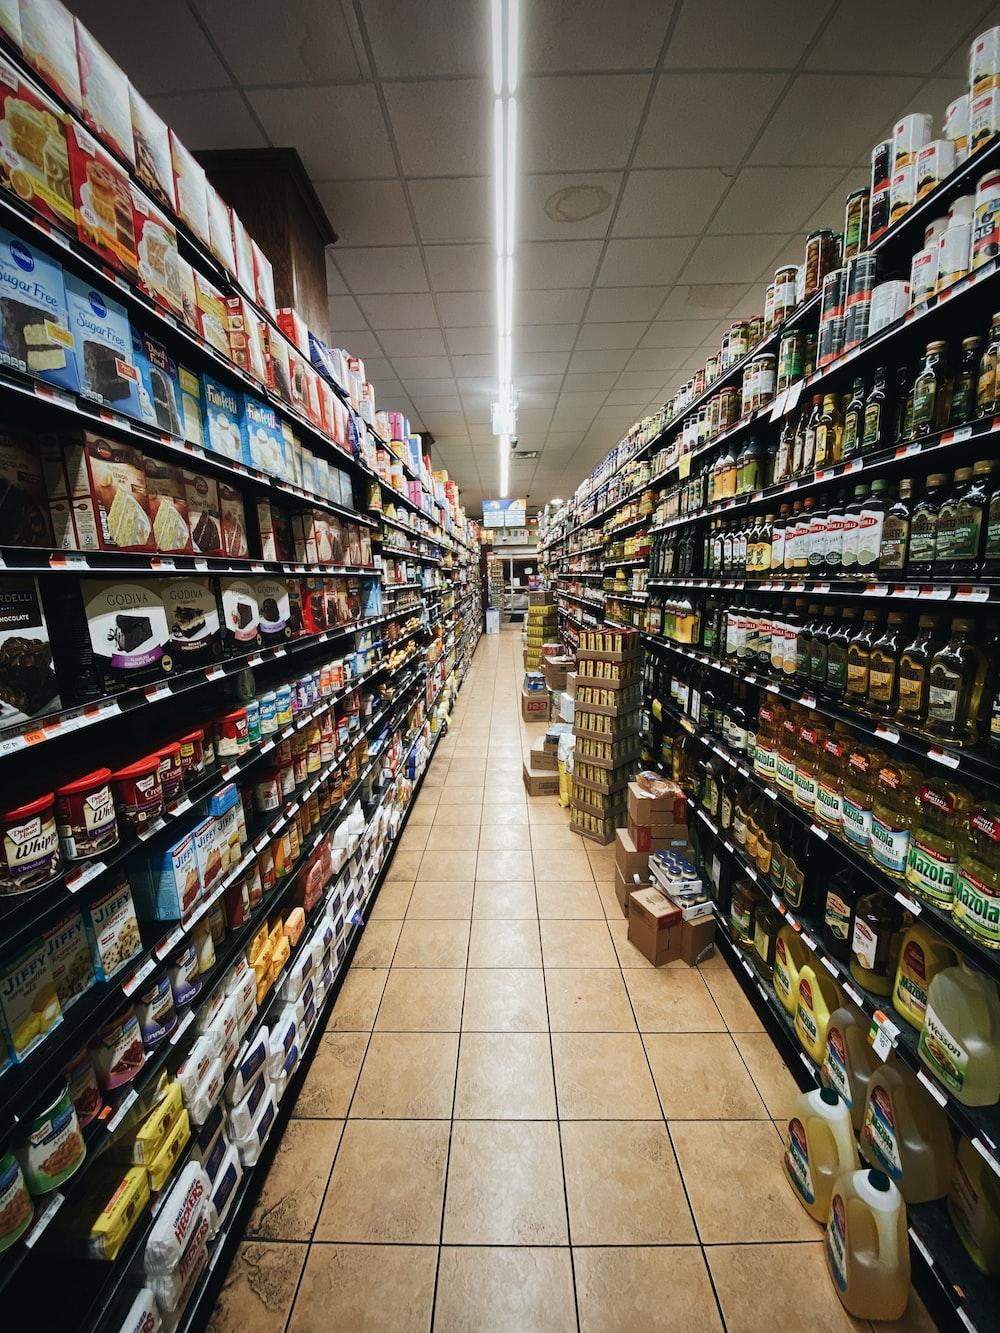 Supermarket Aisle Pictures Download Free Images On Unsplash